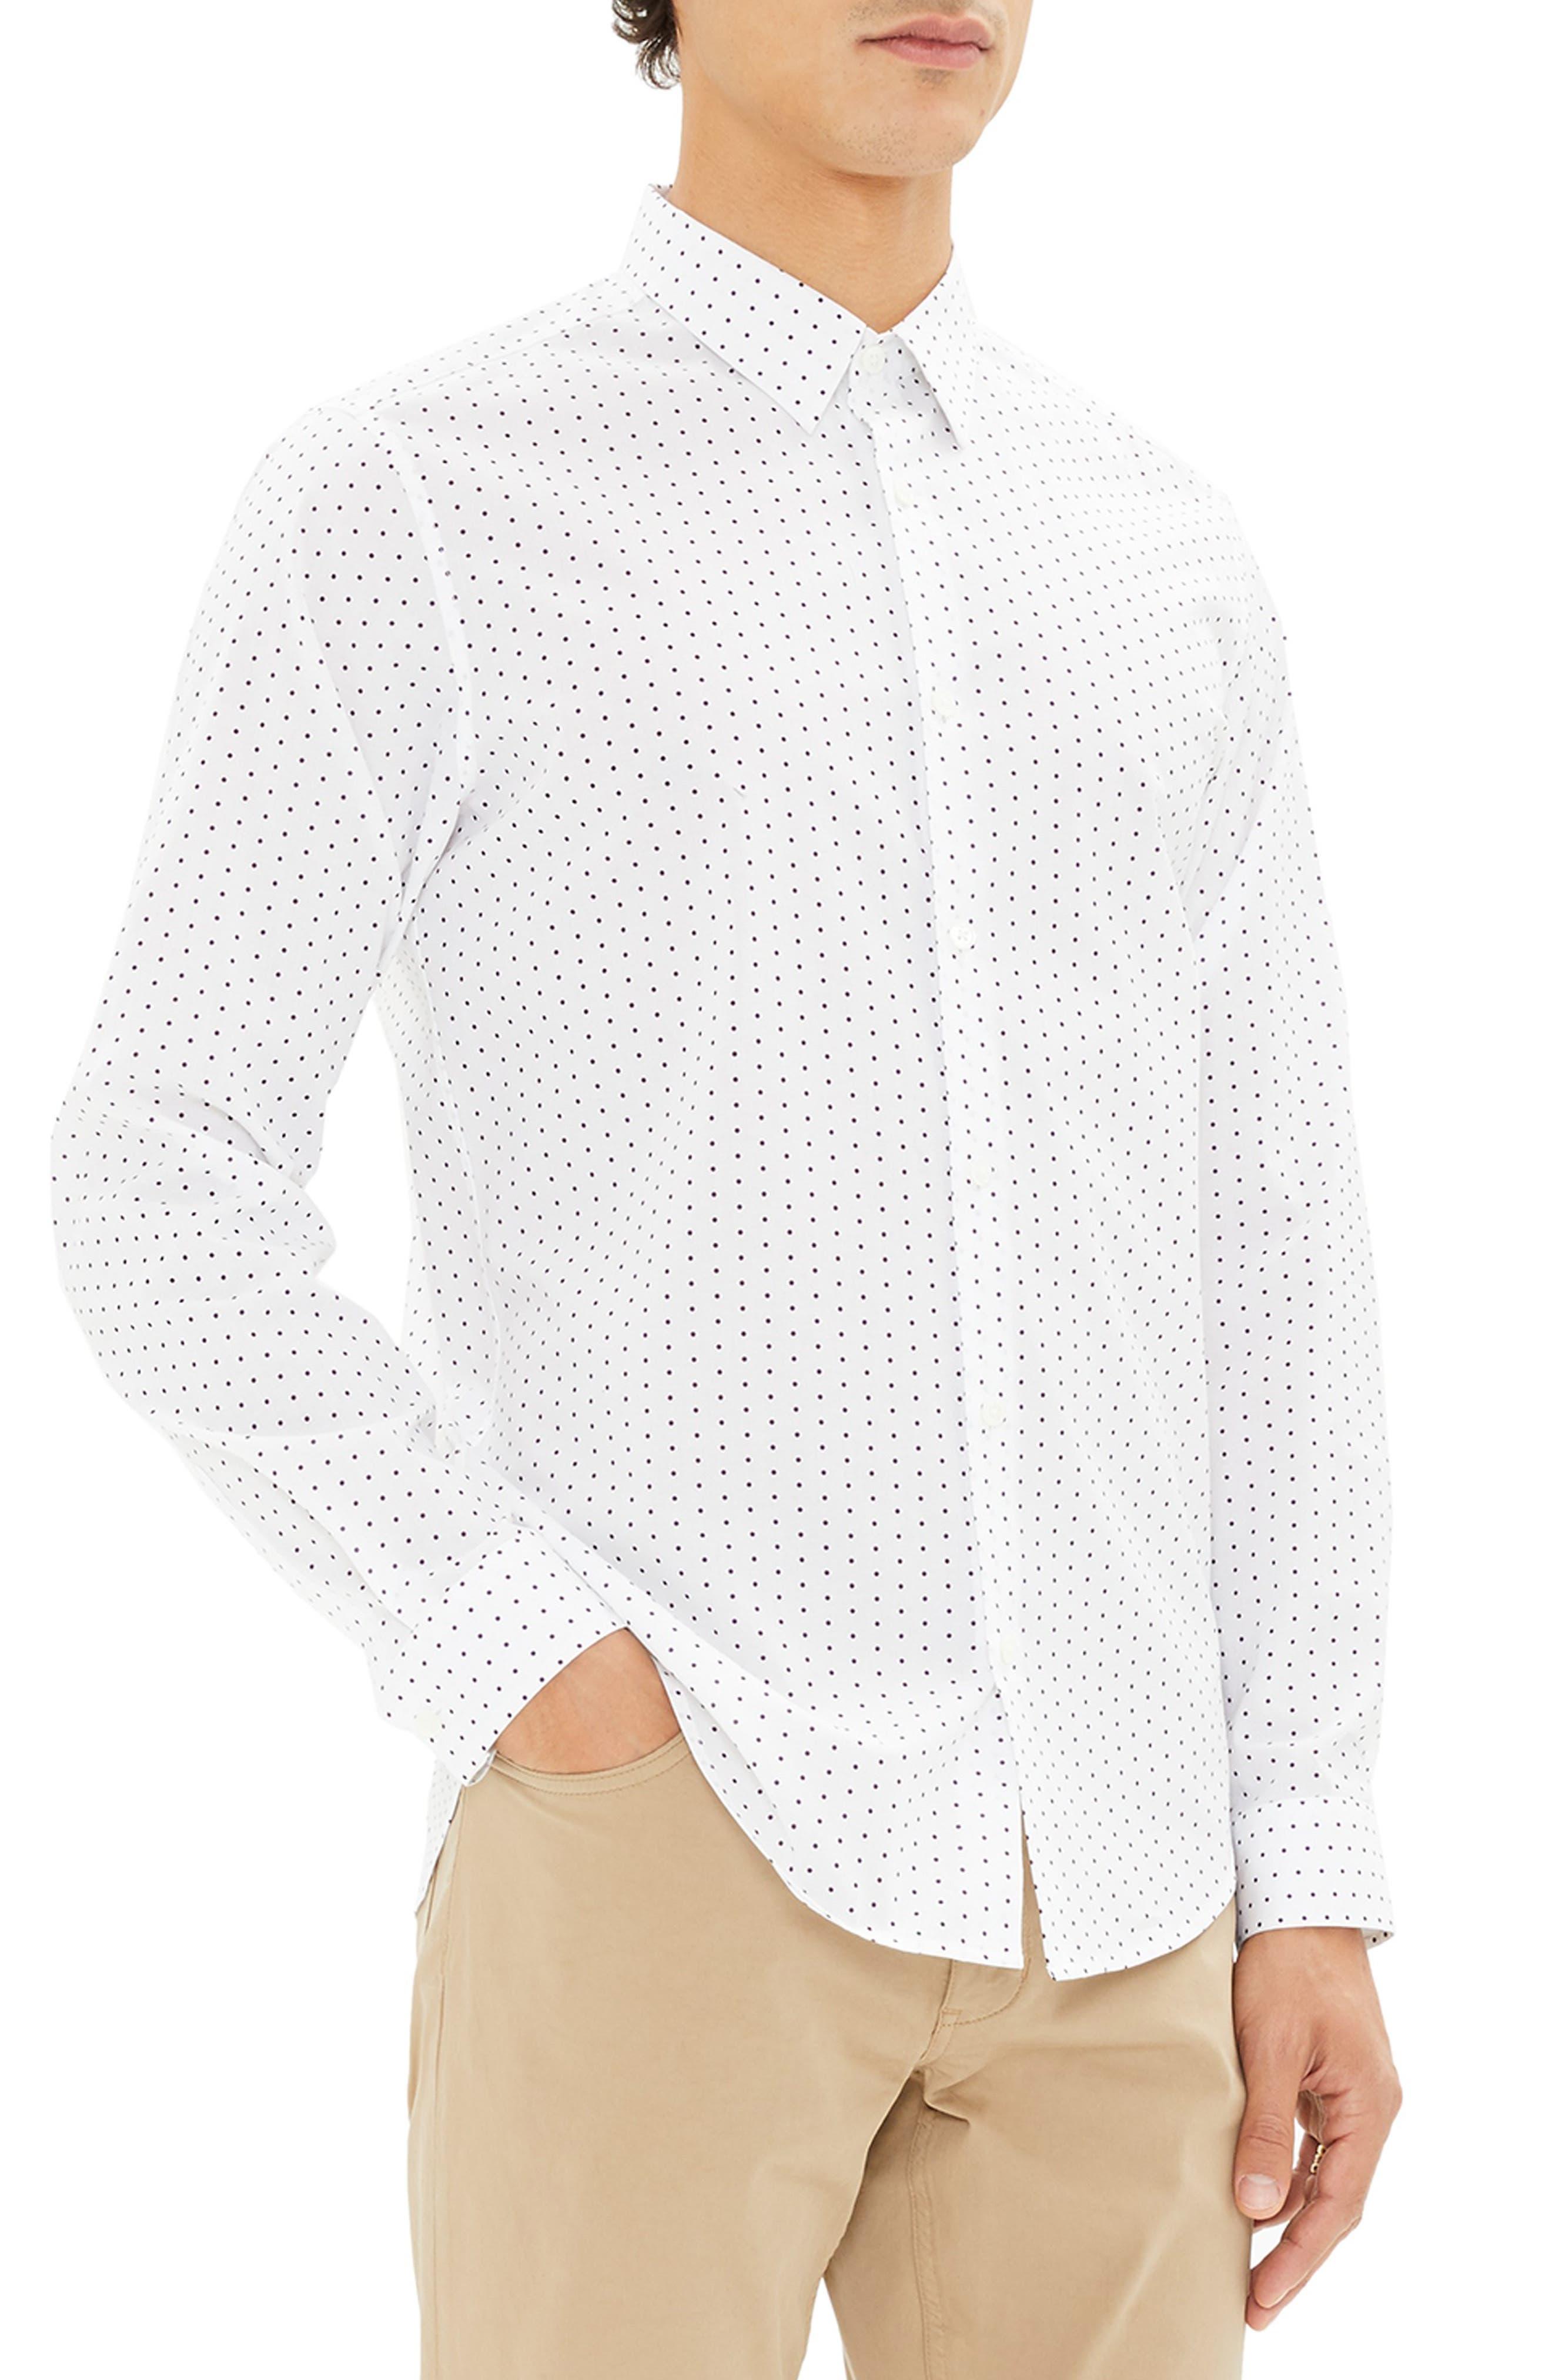 Irving Trim Fit Polka Dot Sport Shirt,                             Alternate thumbnail 3, color,                             110